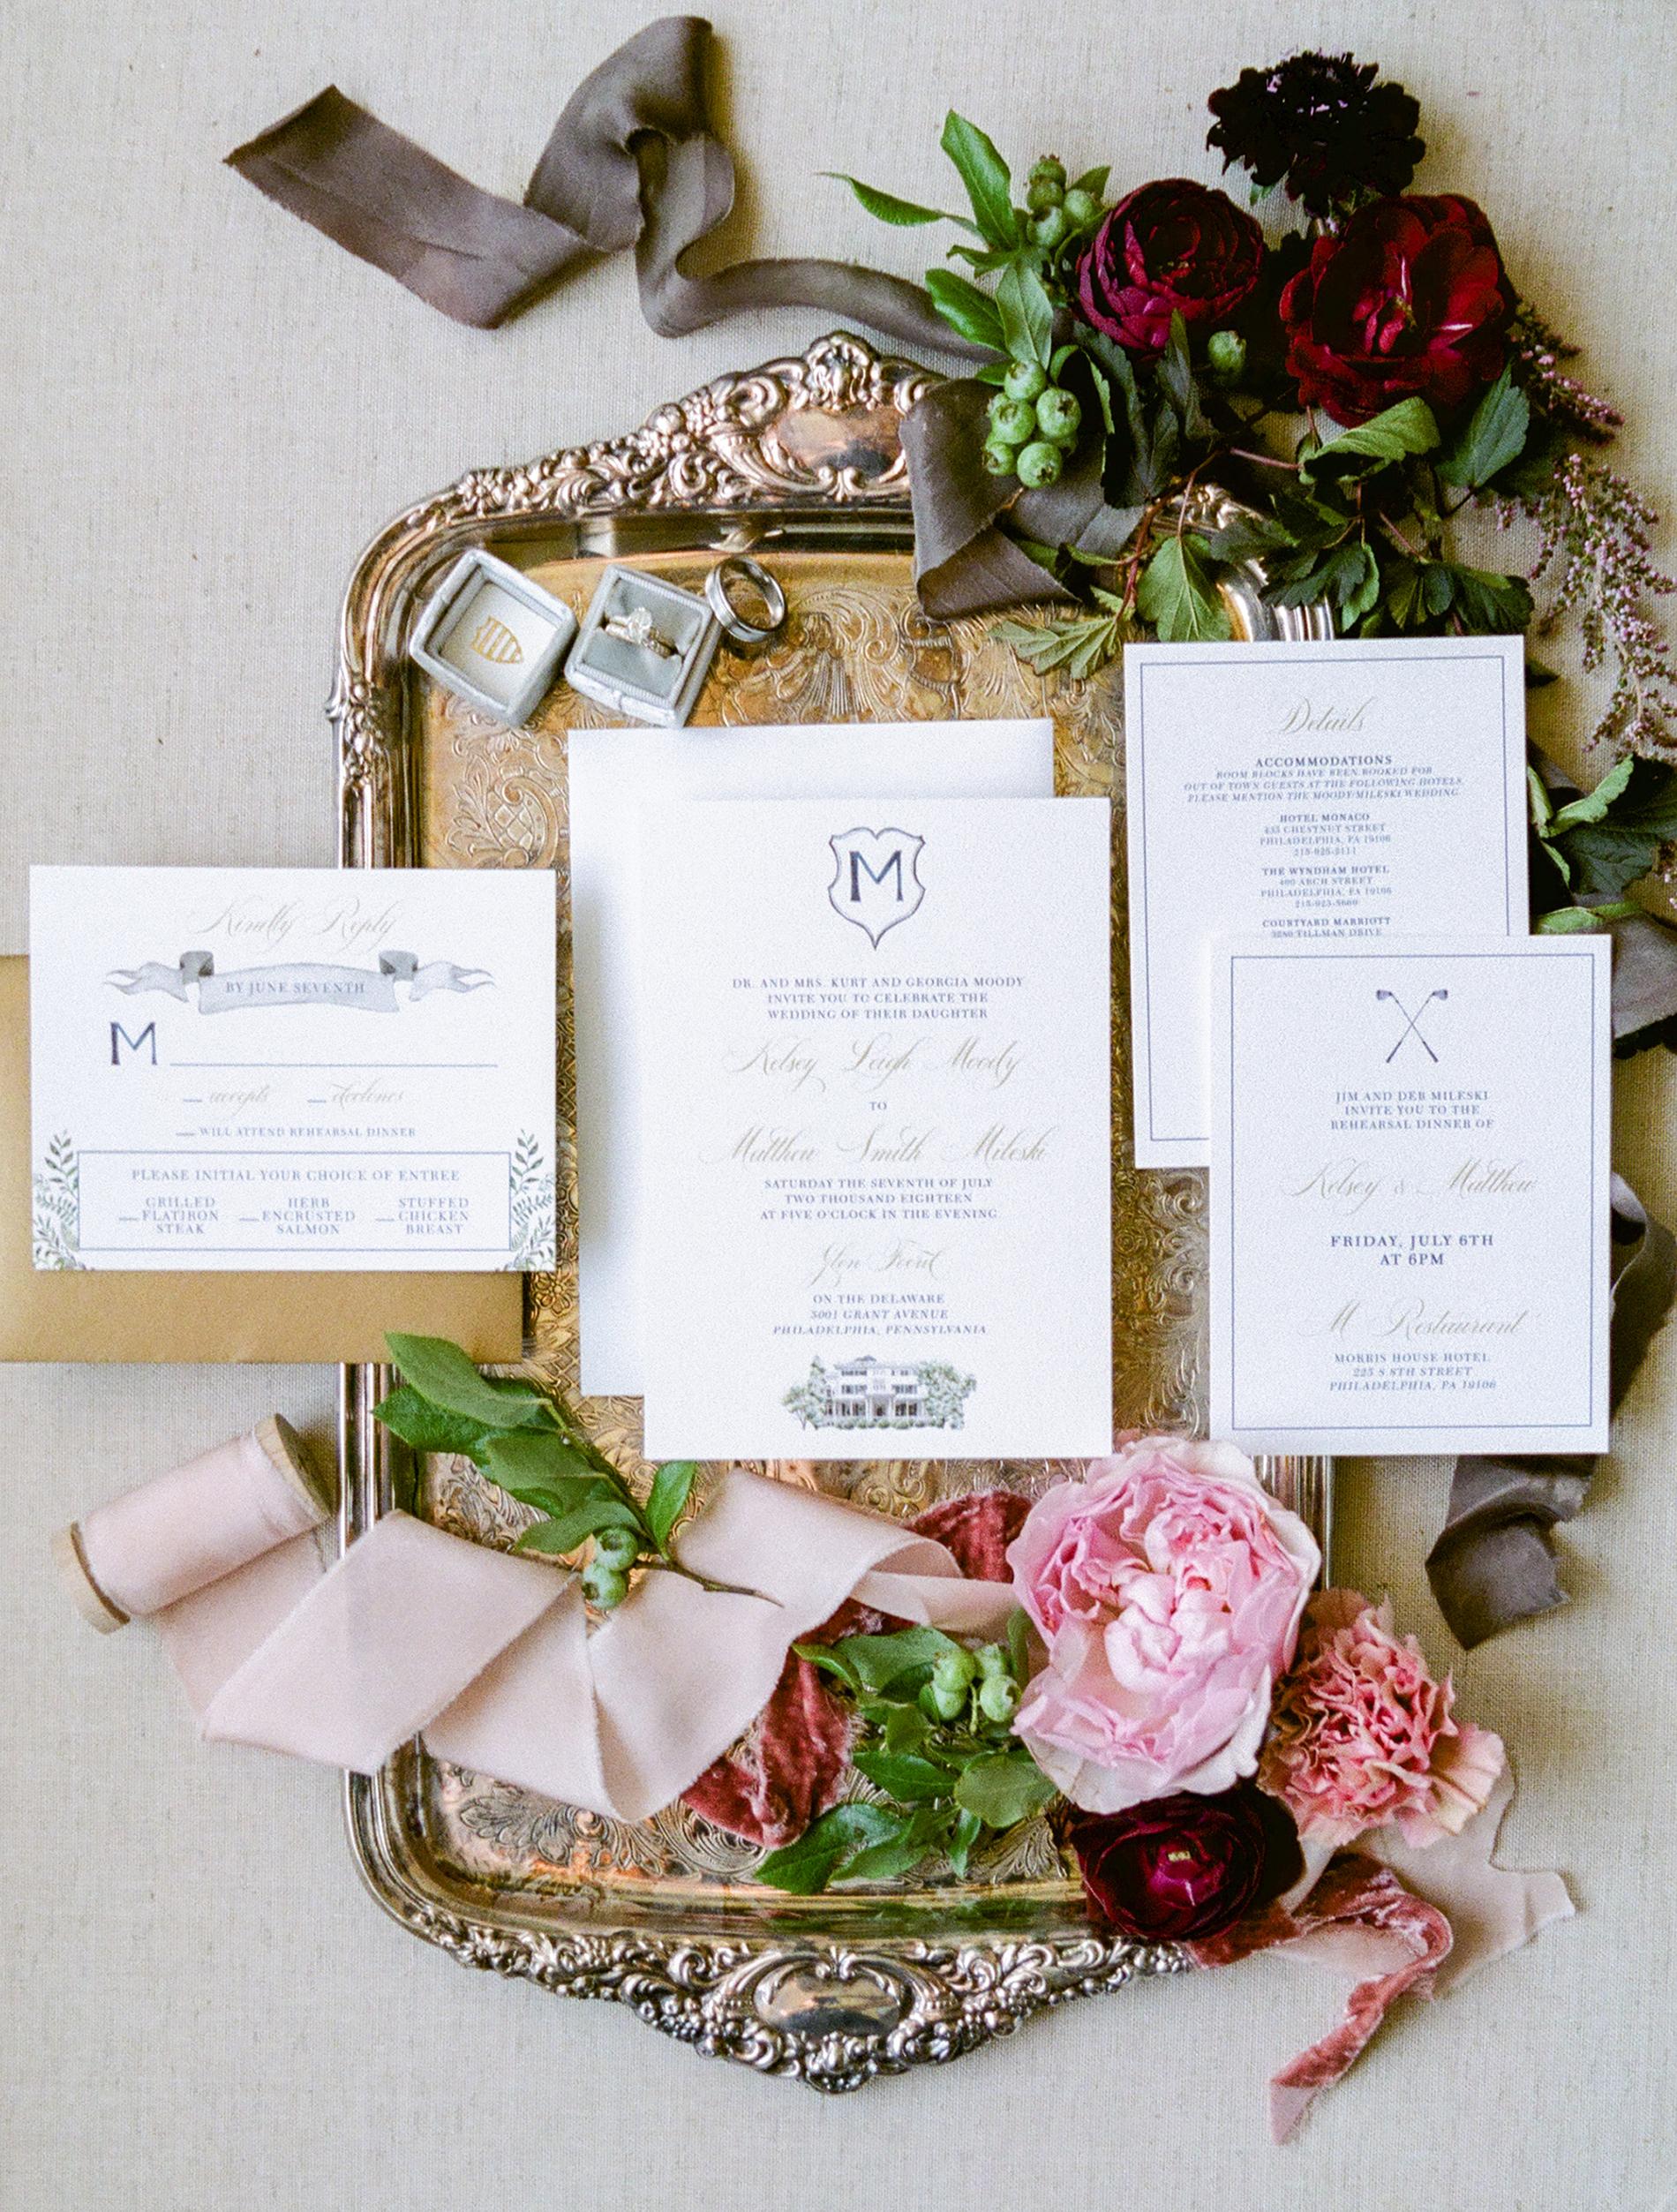 white vintage invite with monogram